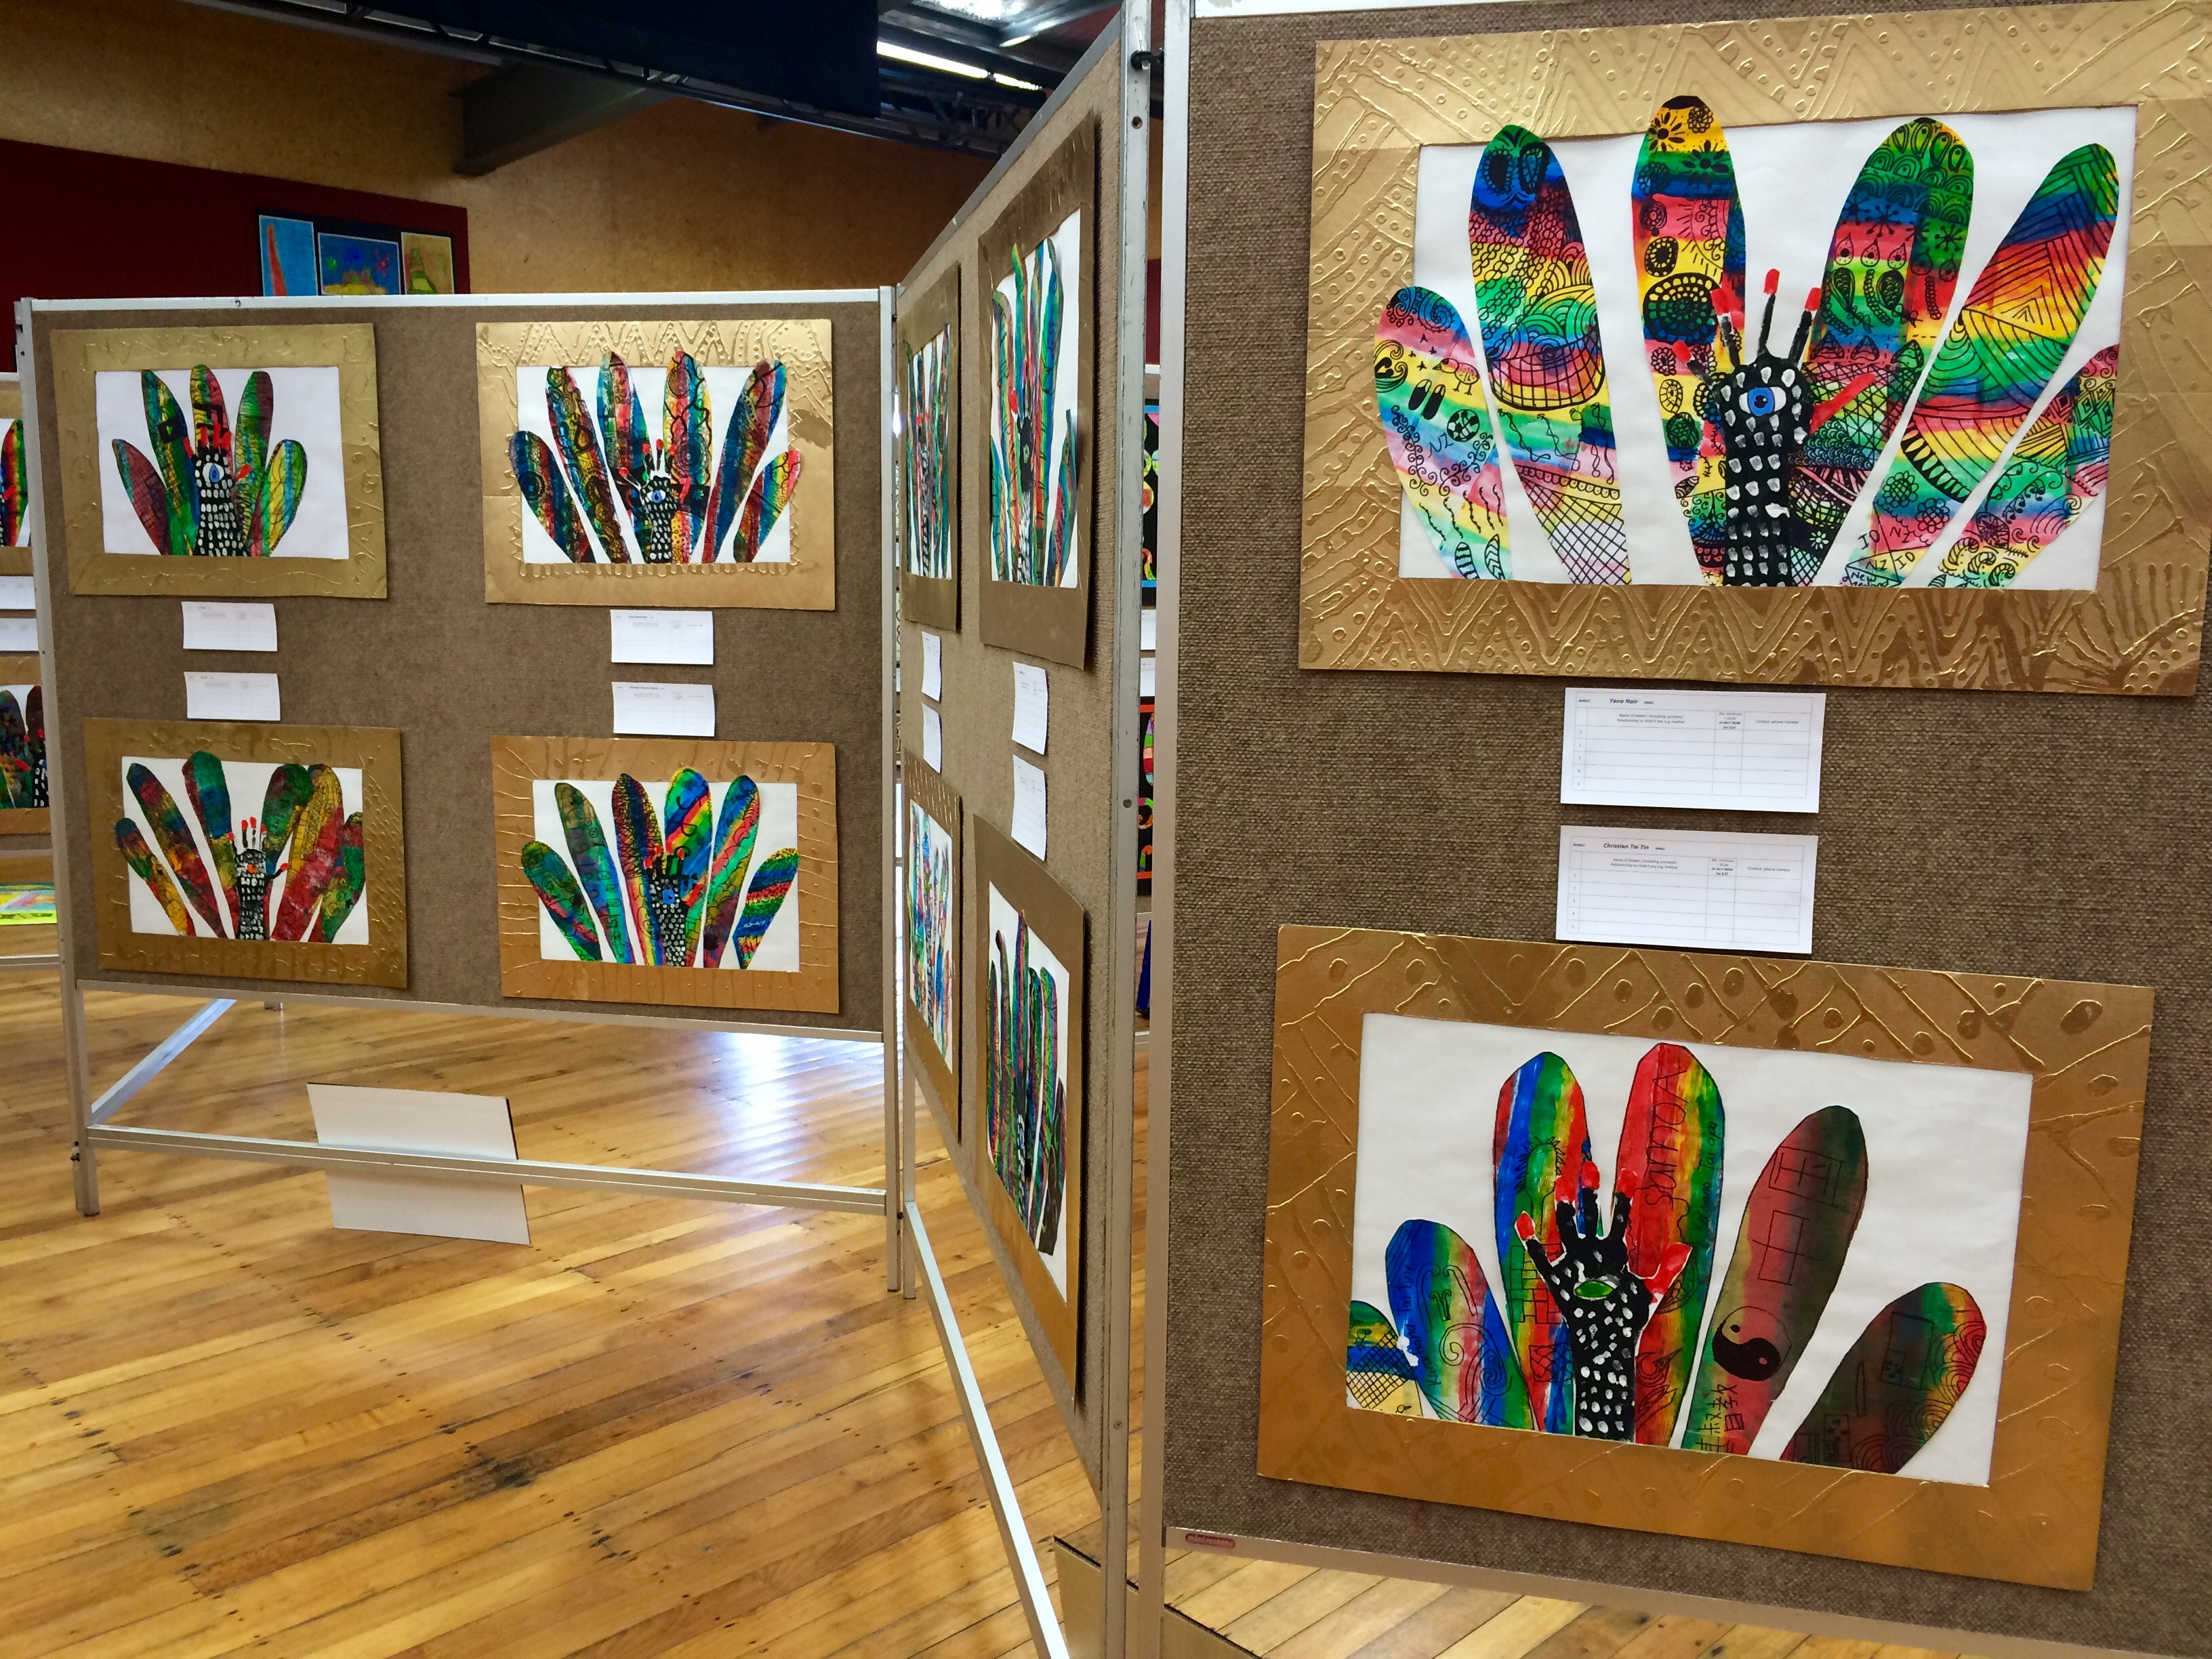 Blockhouse Bay Primary School - The Art Show